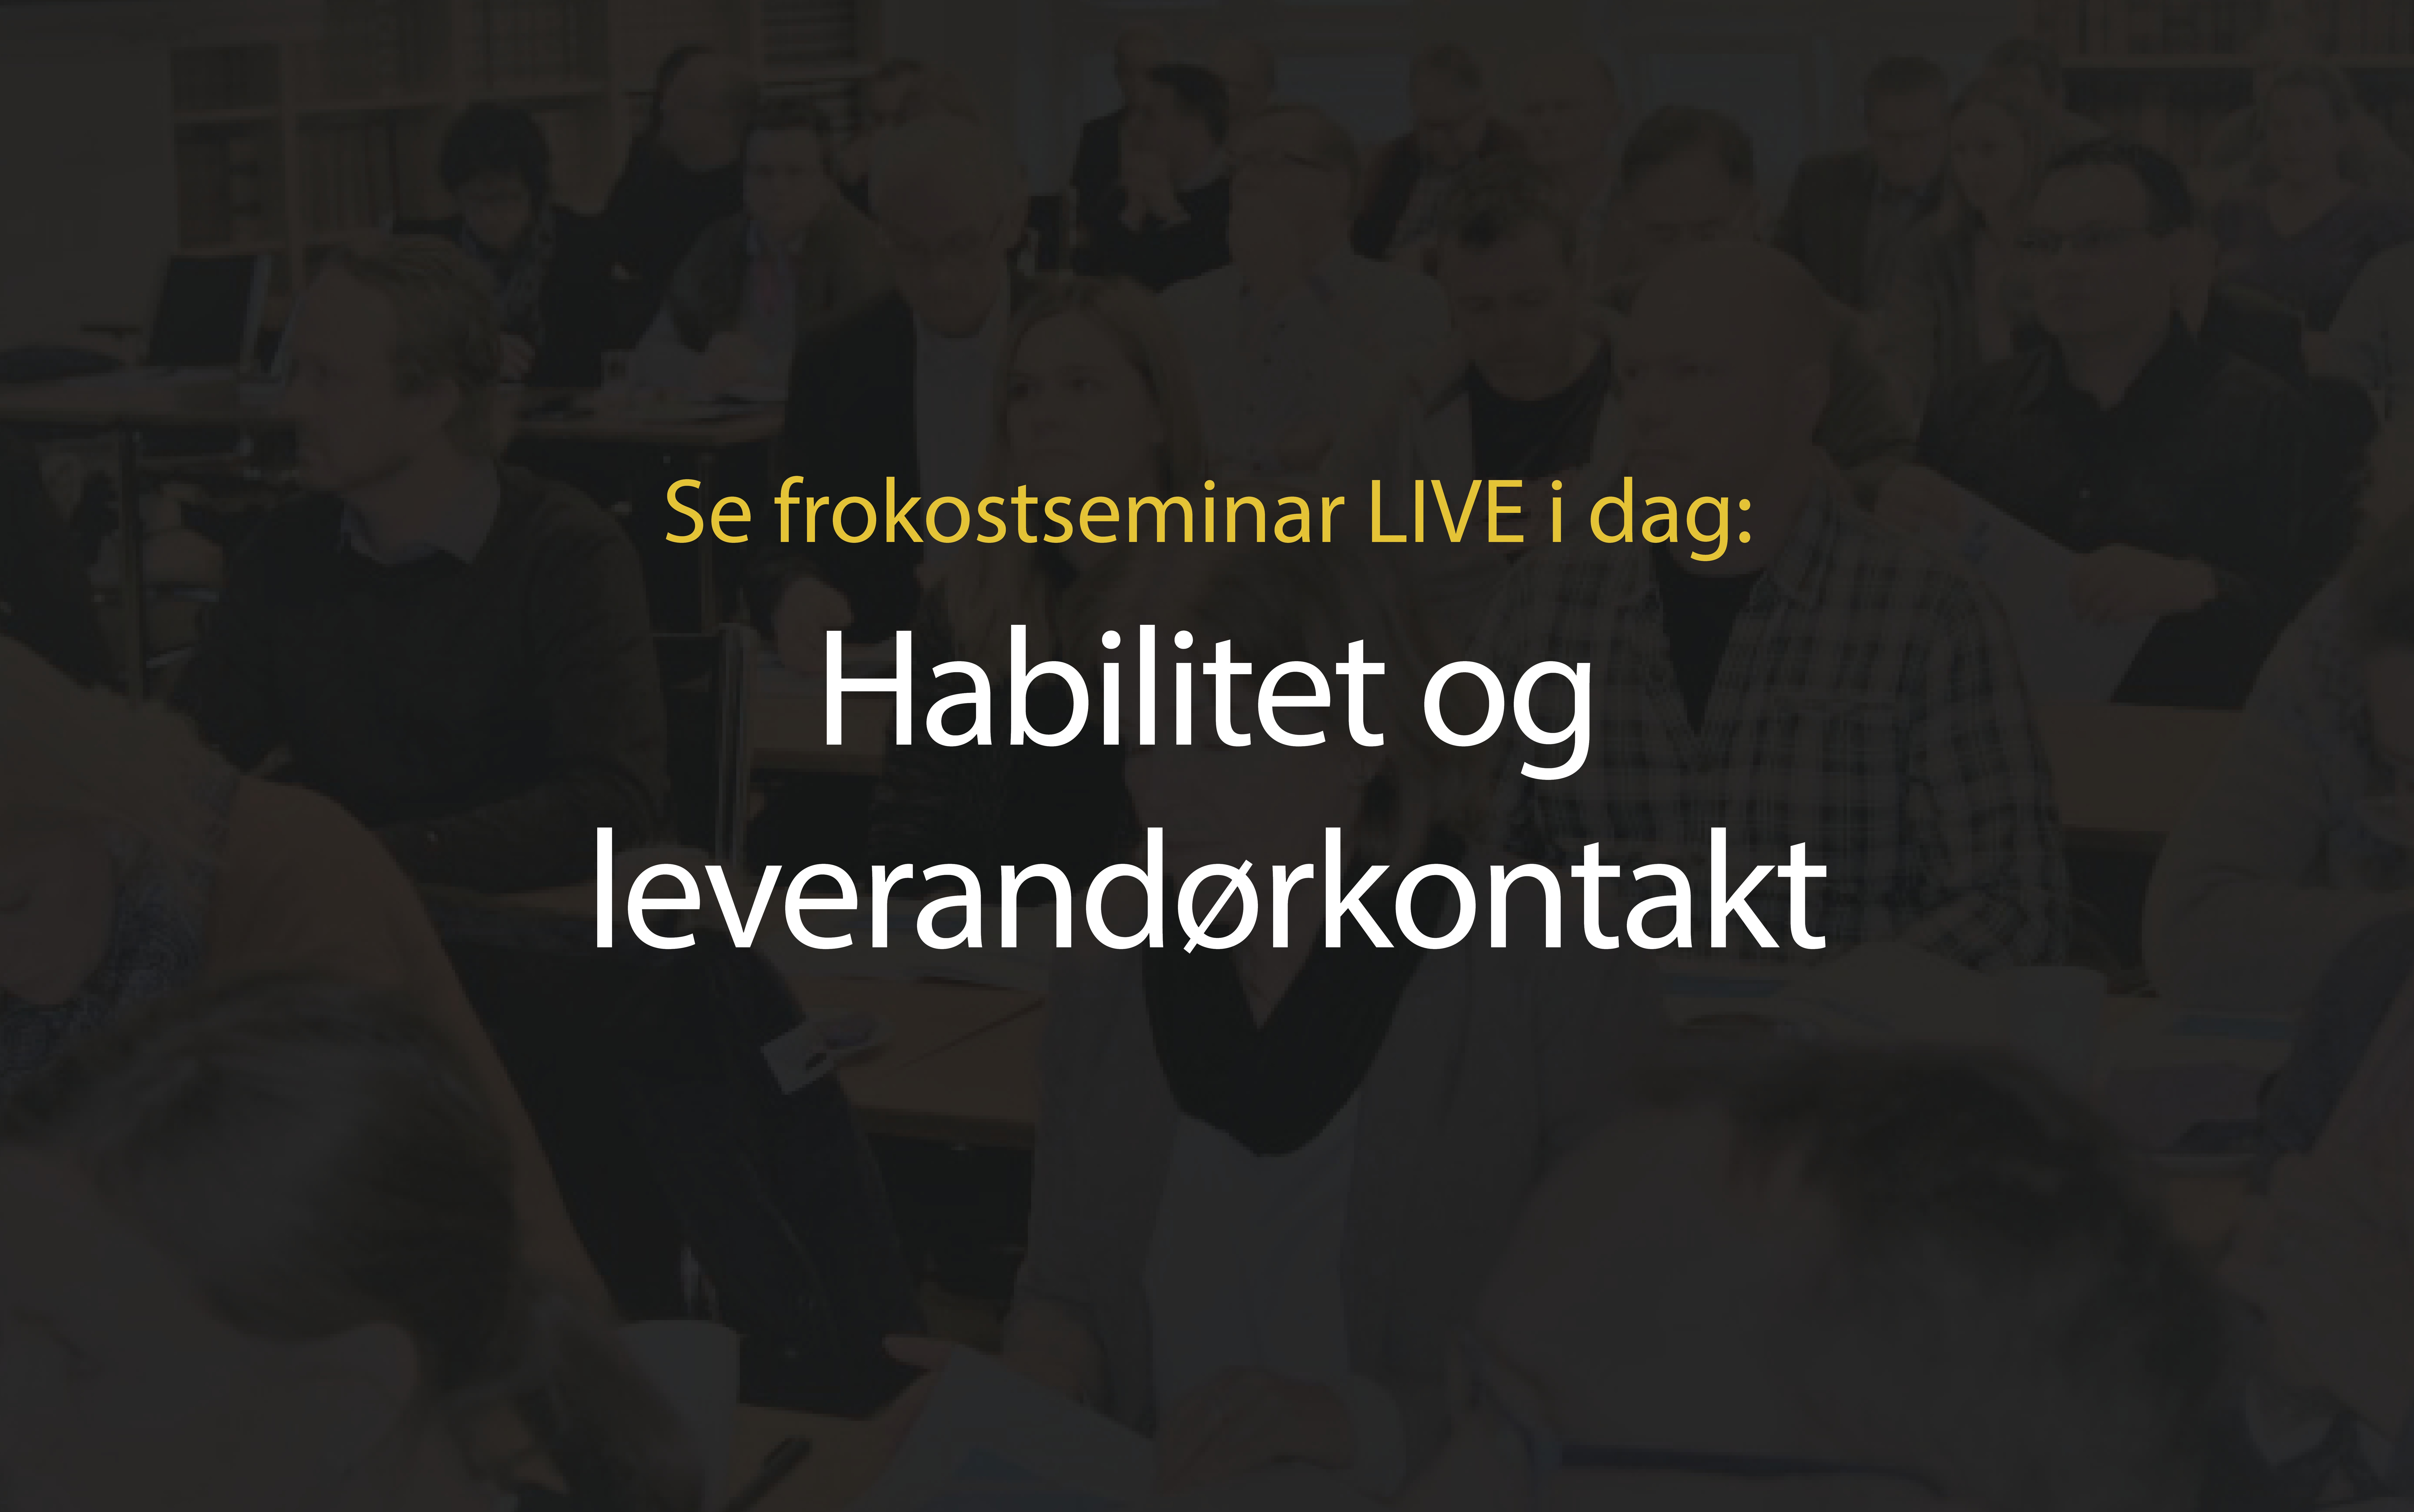 Anbud365: Habilitet og leverandørkontakt – følg dagens Anbud365-seminar på LIVE streaming.